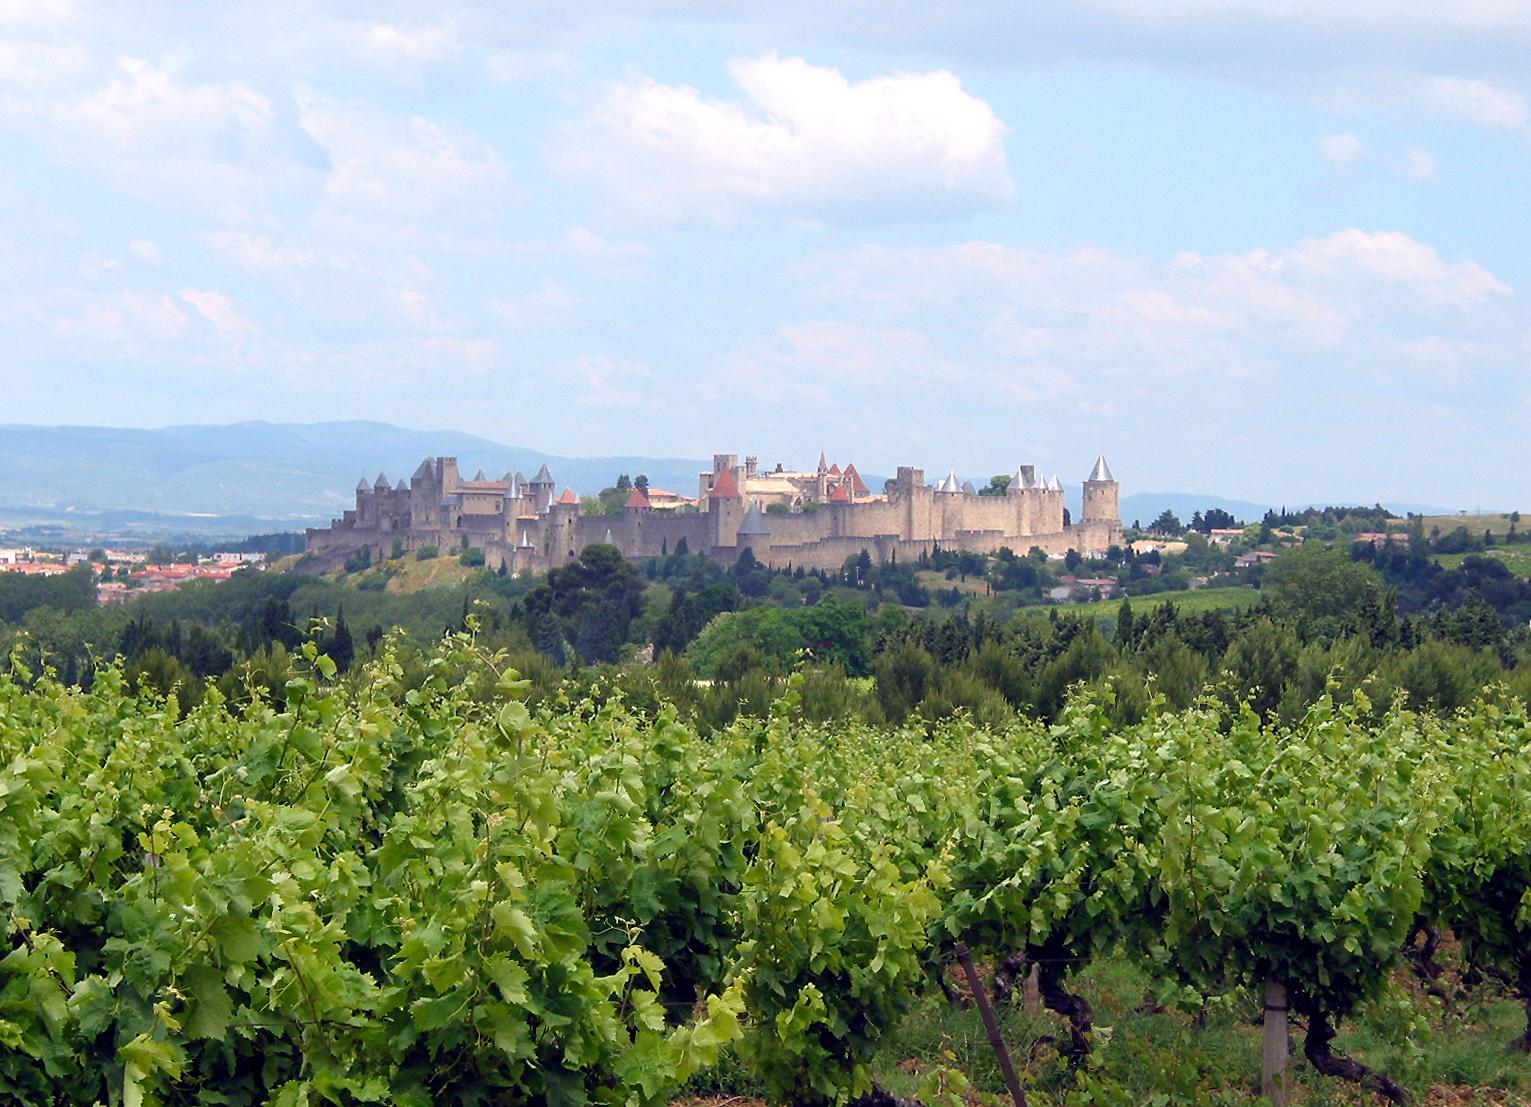 carcassonne - Good people larp